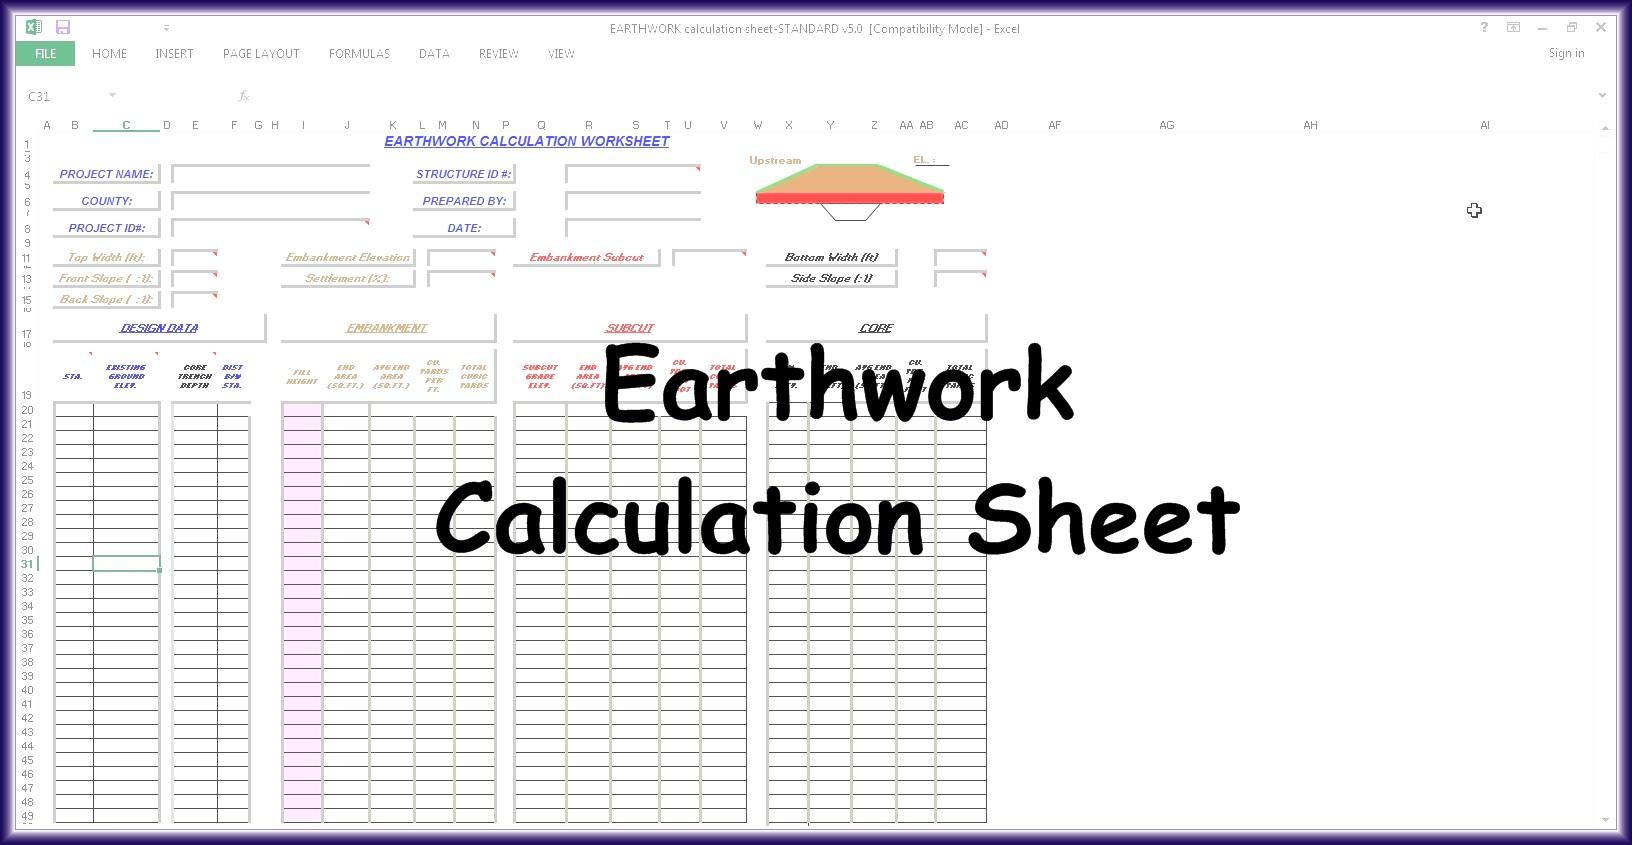 Earthwork Calculation Spreadsheet Spreadsheet Downloa Earthwork Calculation Spreadsheet